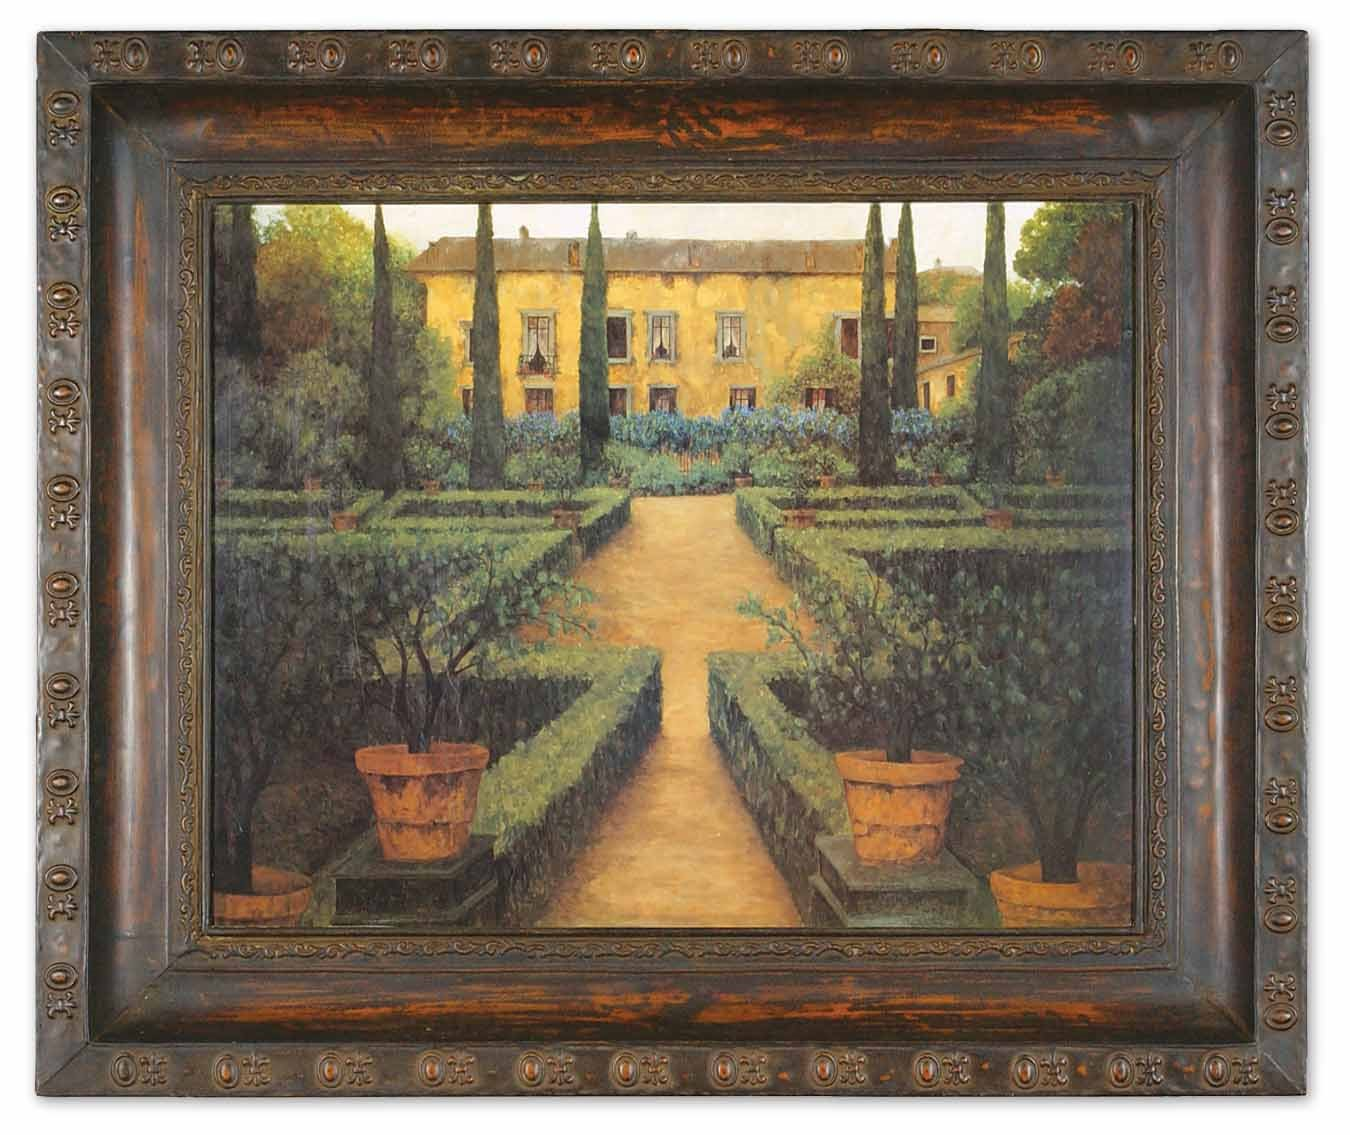 Uttermost 50422 Garden Manor Traditional Canvas Wall Art